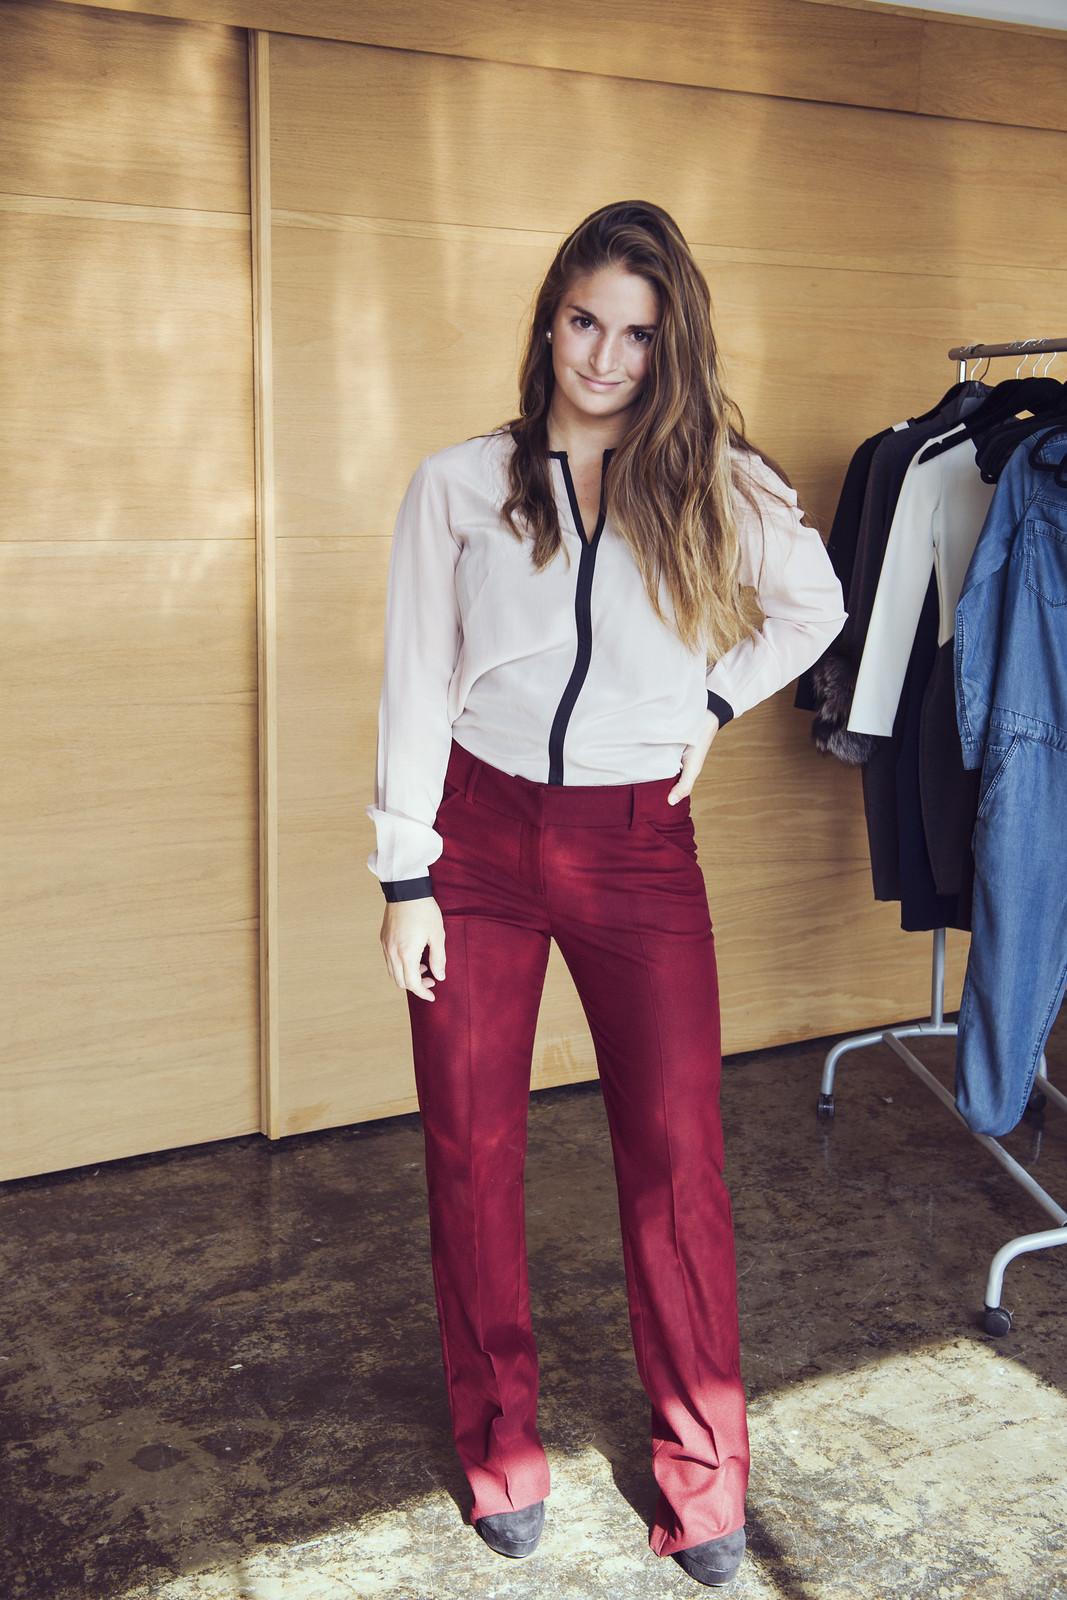 iris setlakwe, audrey, audrey andrade garcia, pantalon rouge, red pant, look, lookbook, lecahier